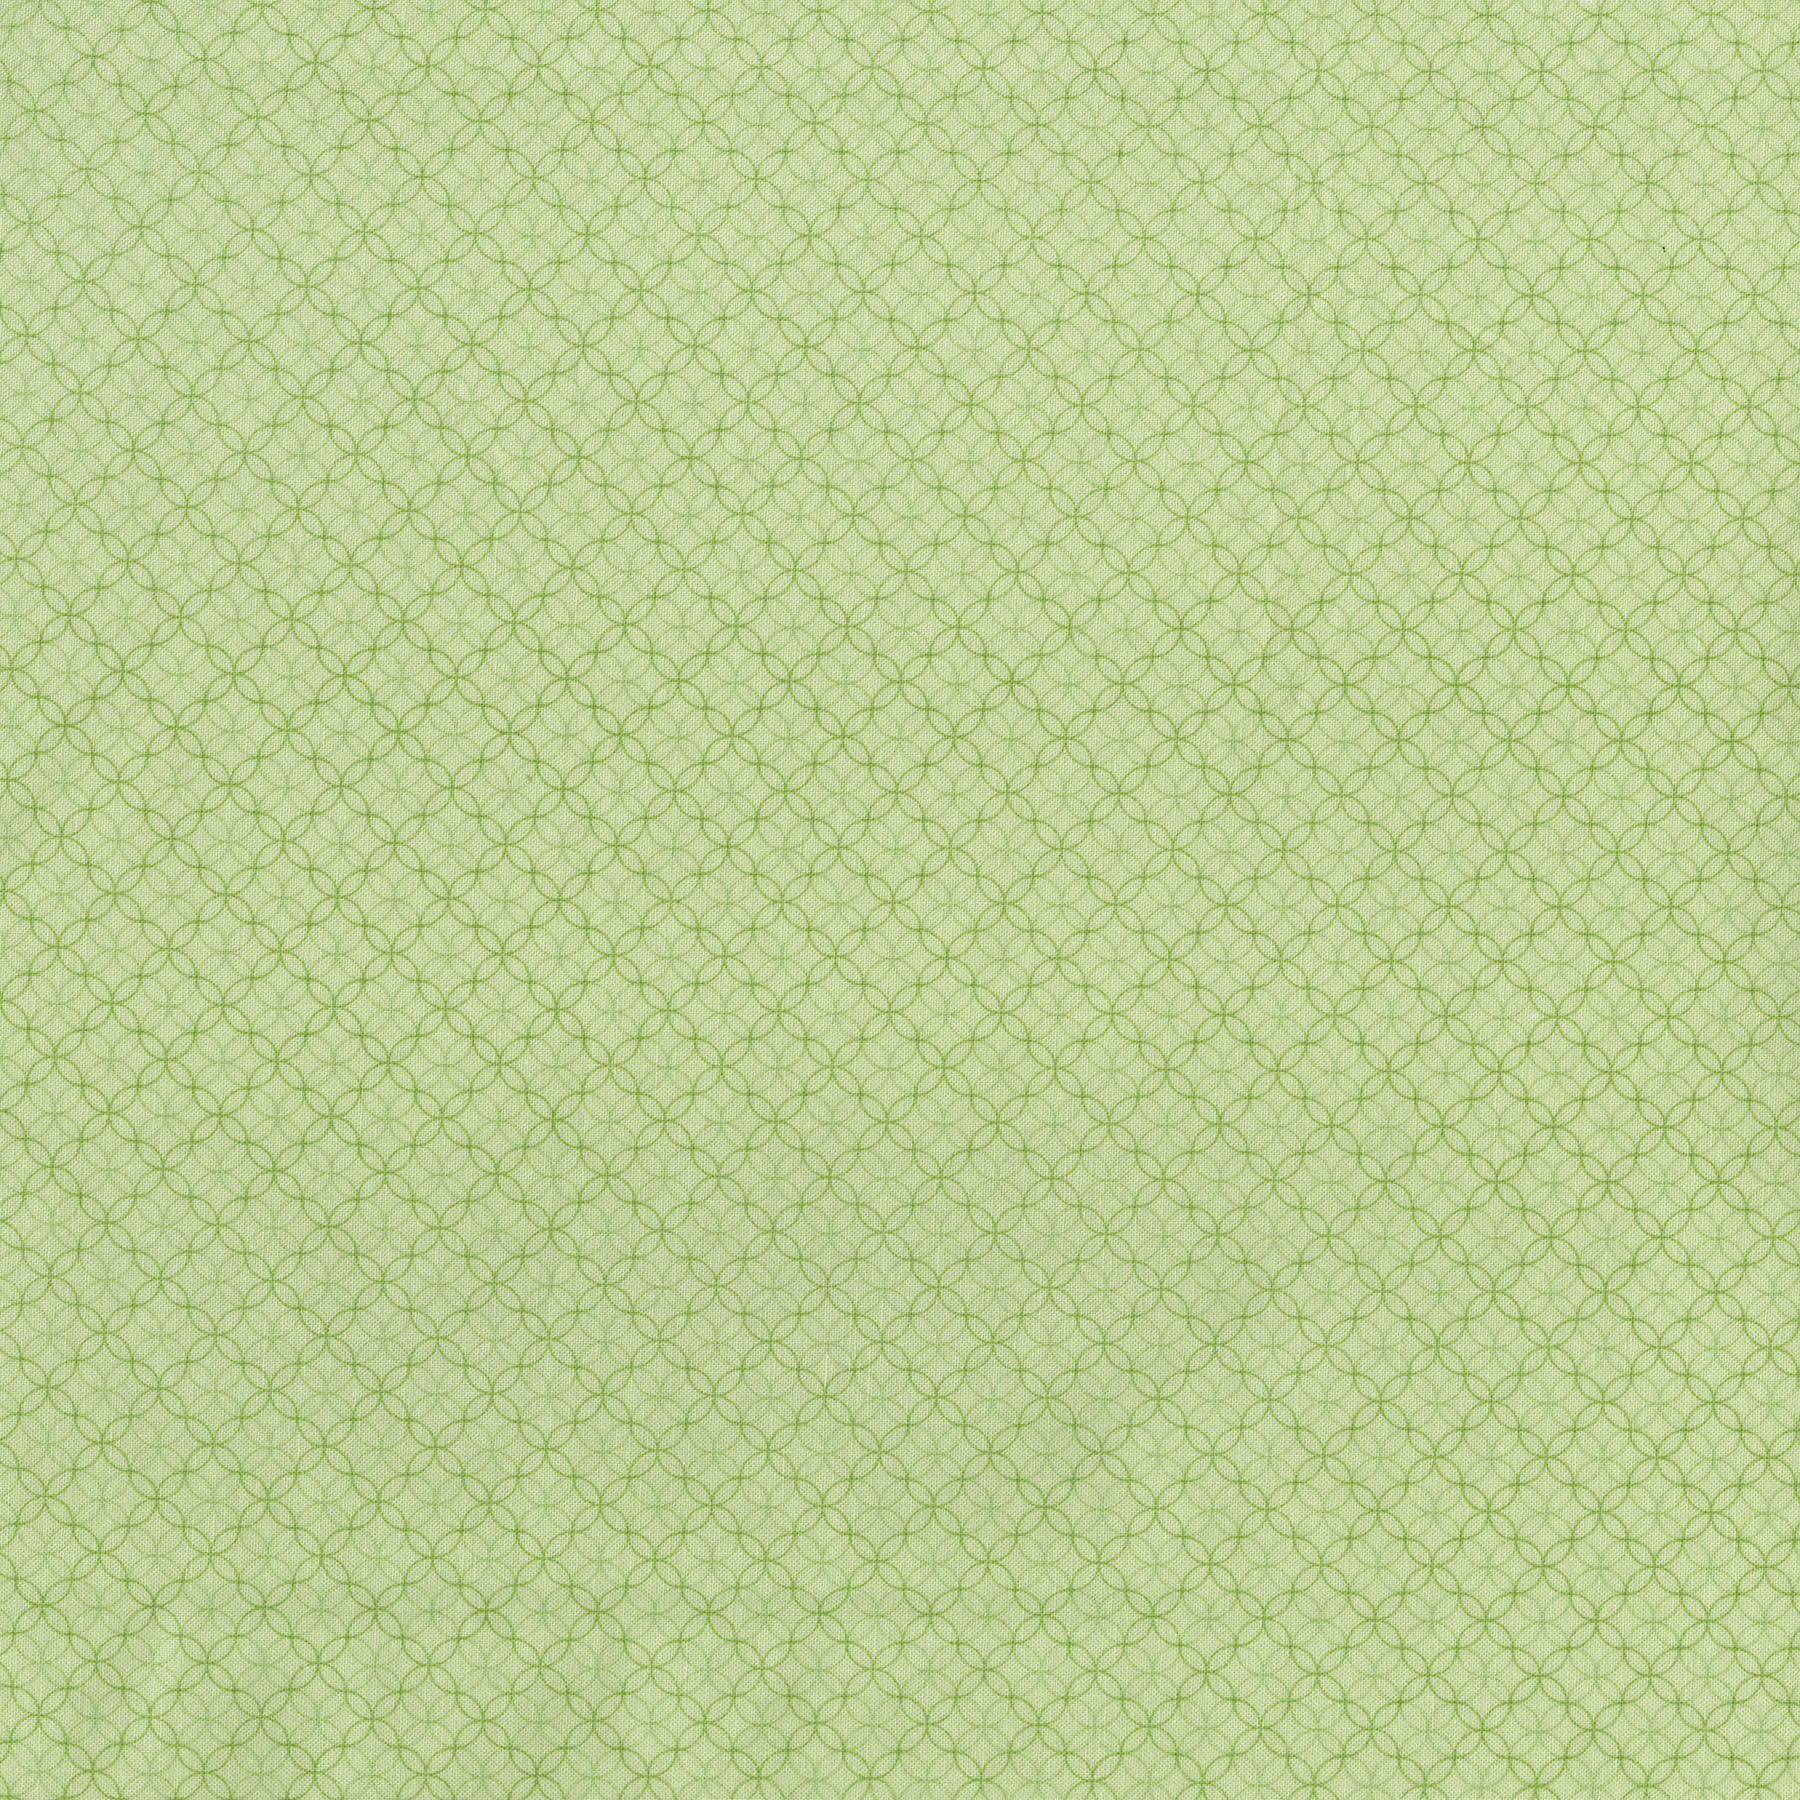 2921-001 ROXBURY - PERIDOT